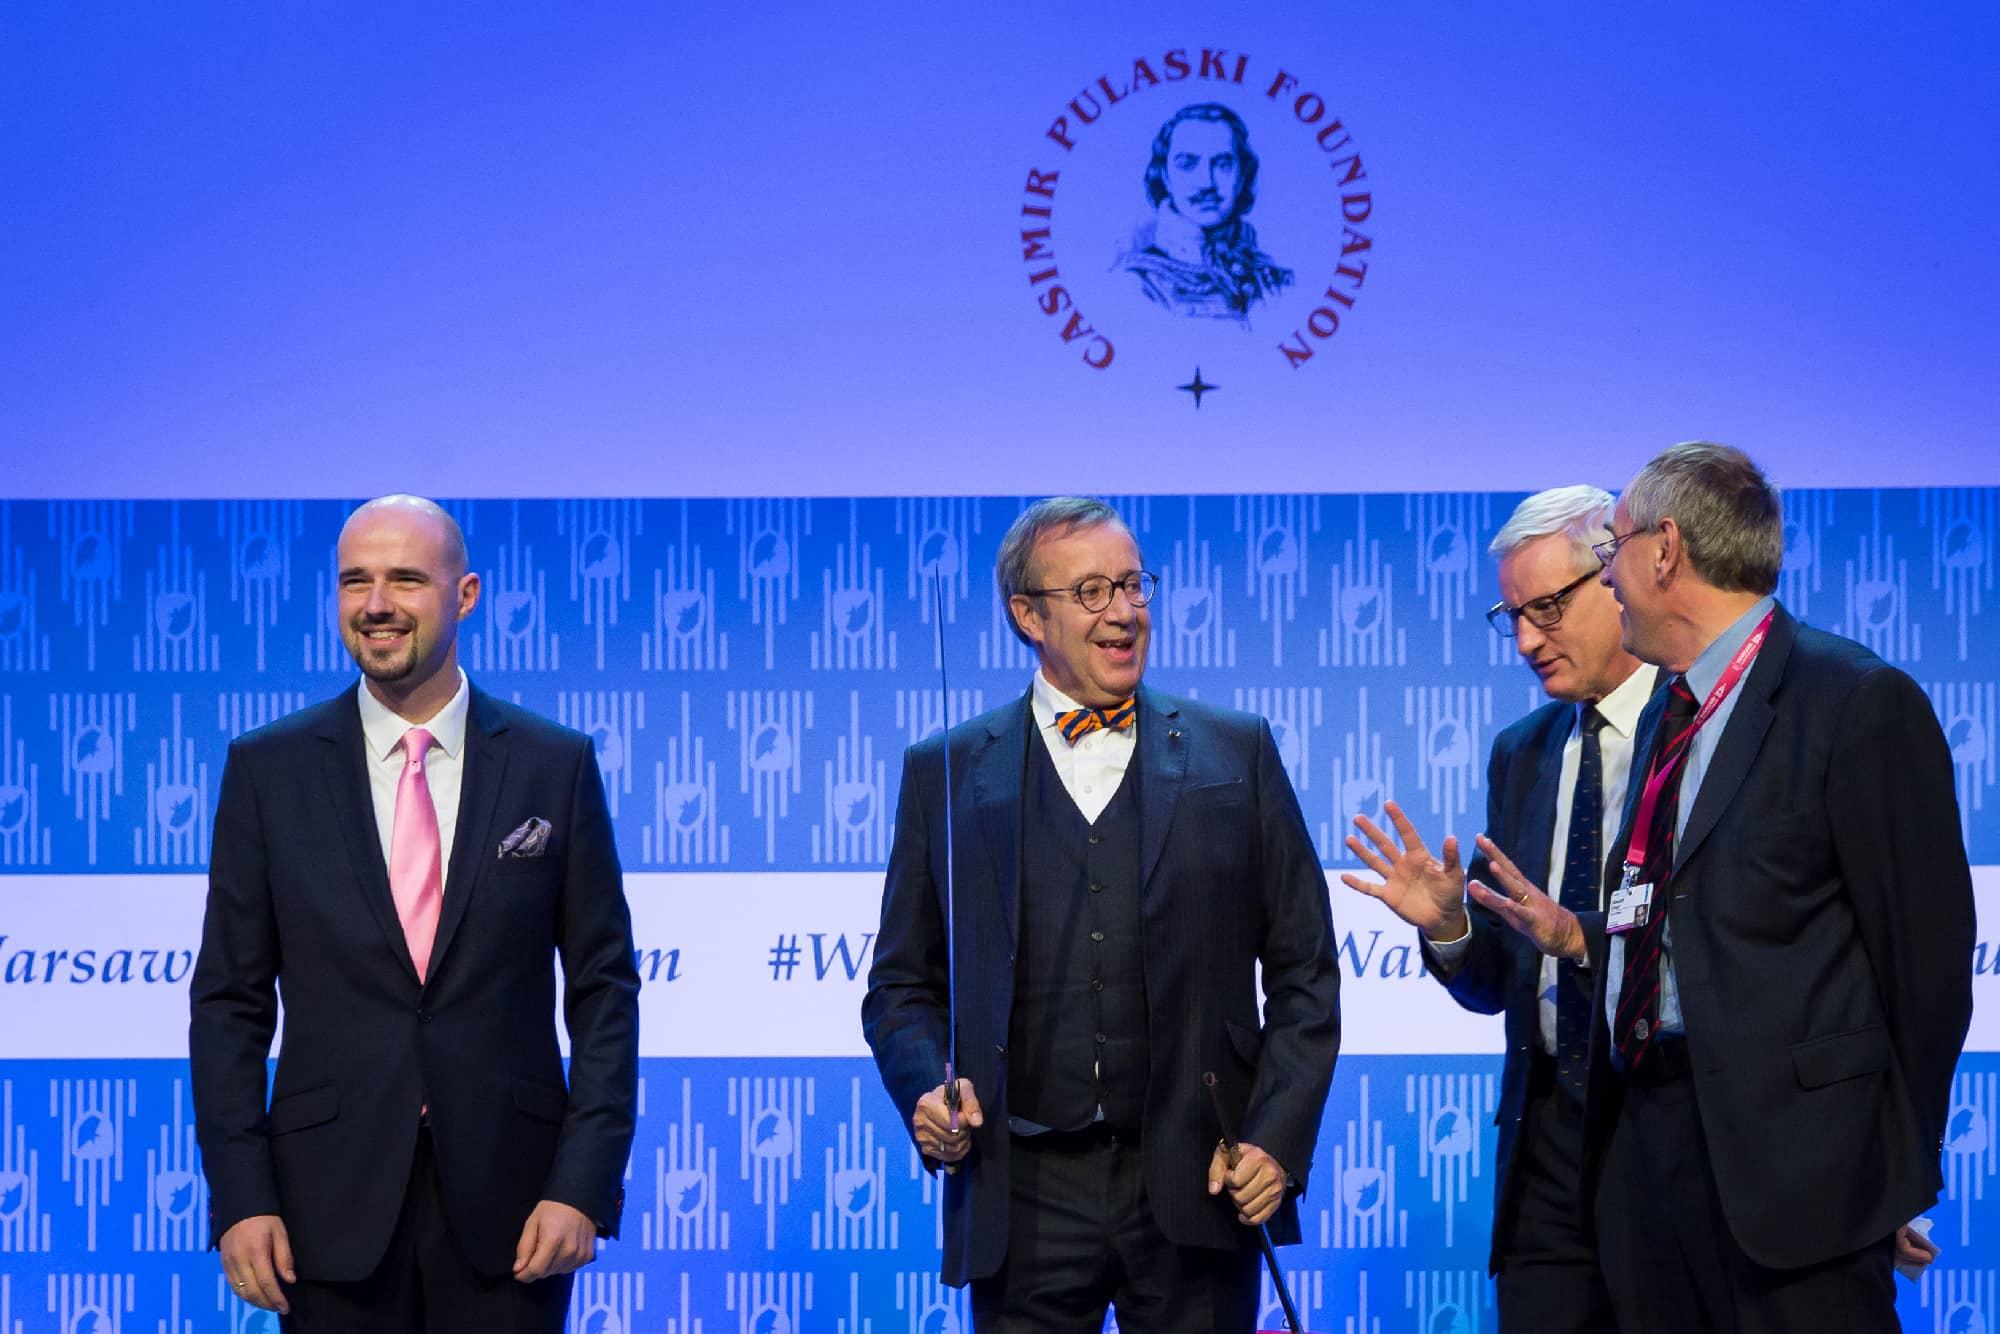 Knight of Freedom Award for Toomas Hendrik Ilves